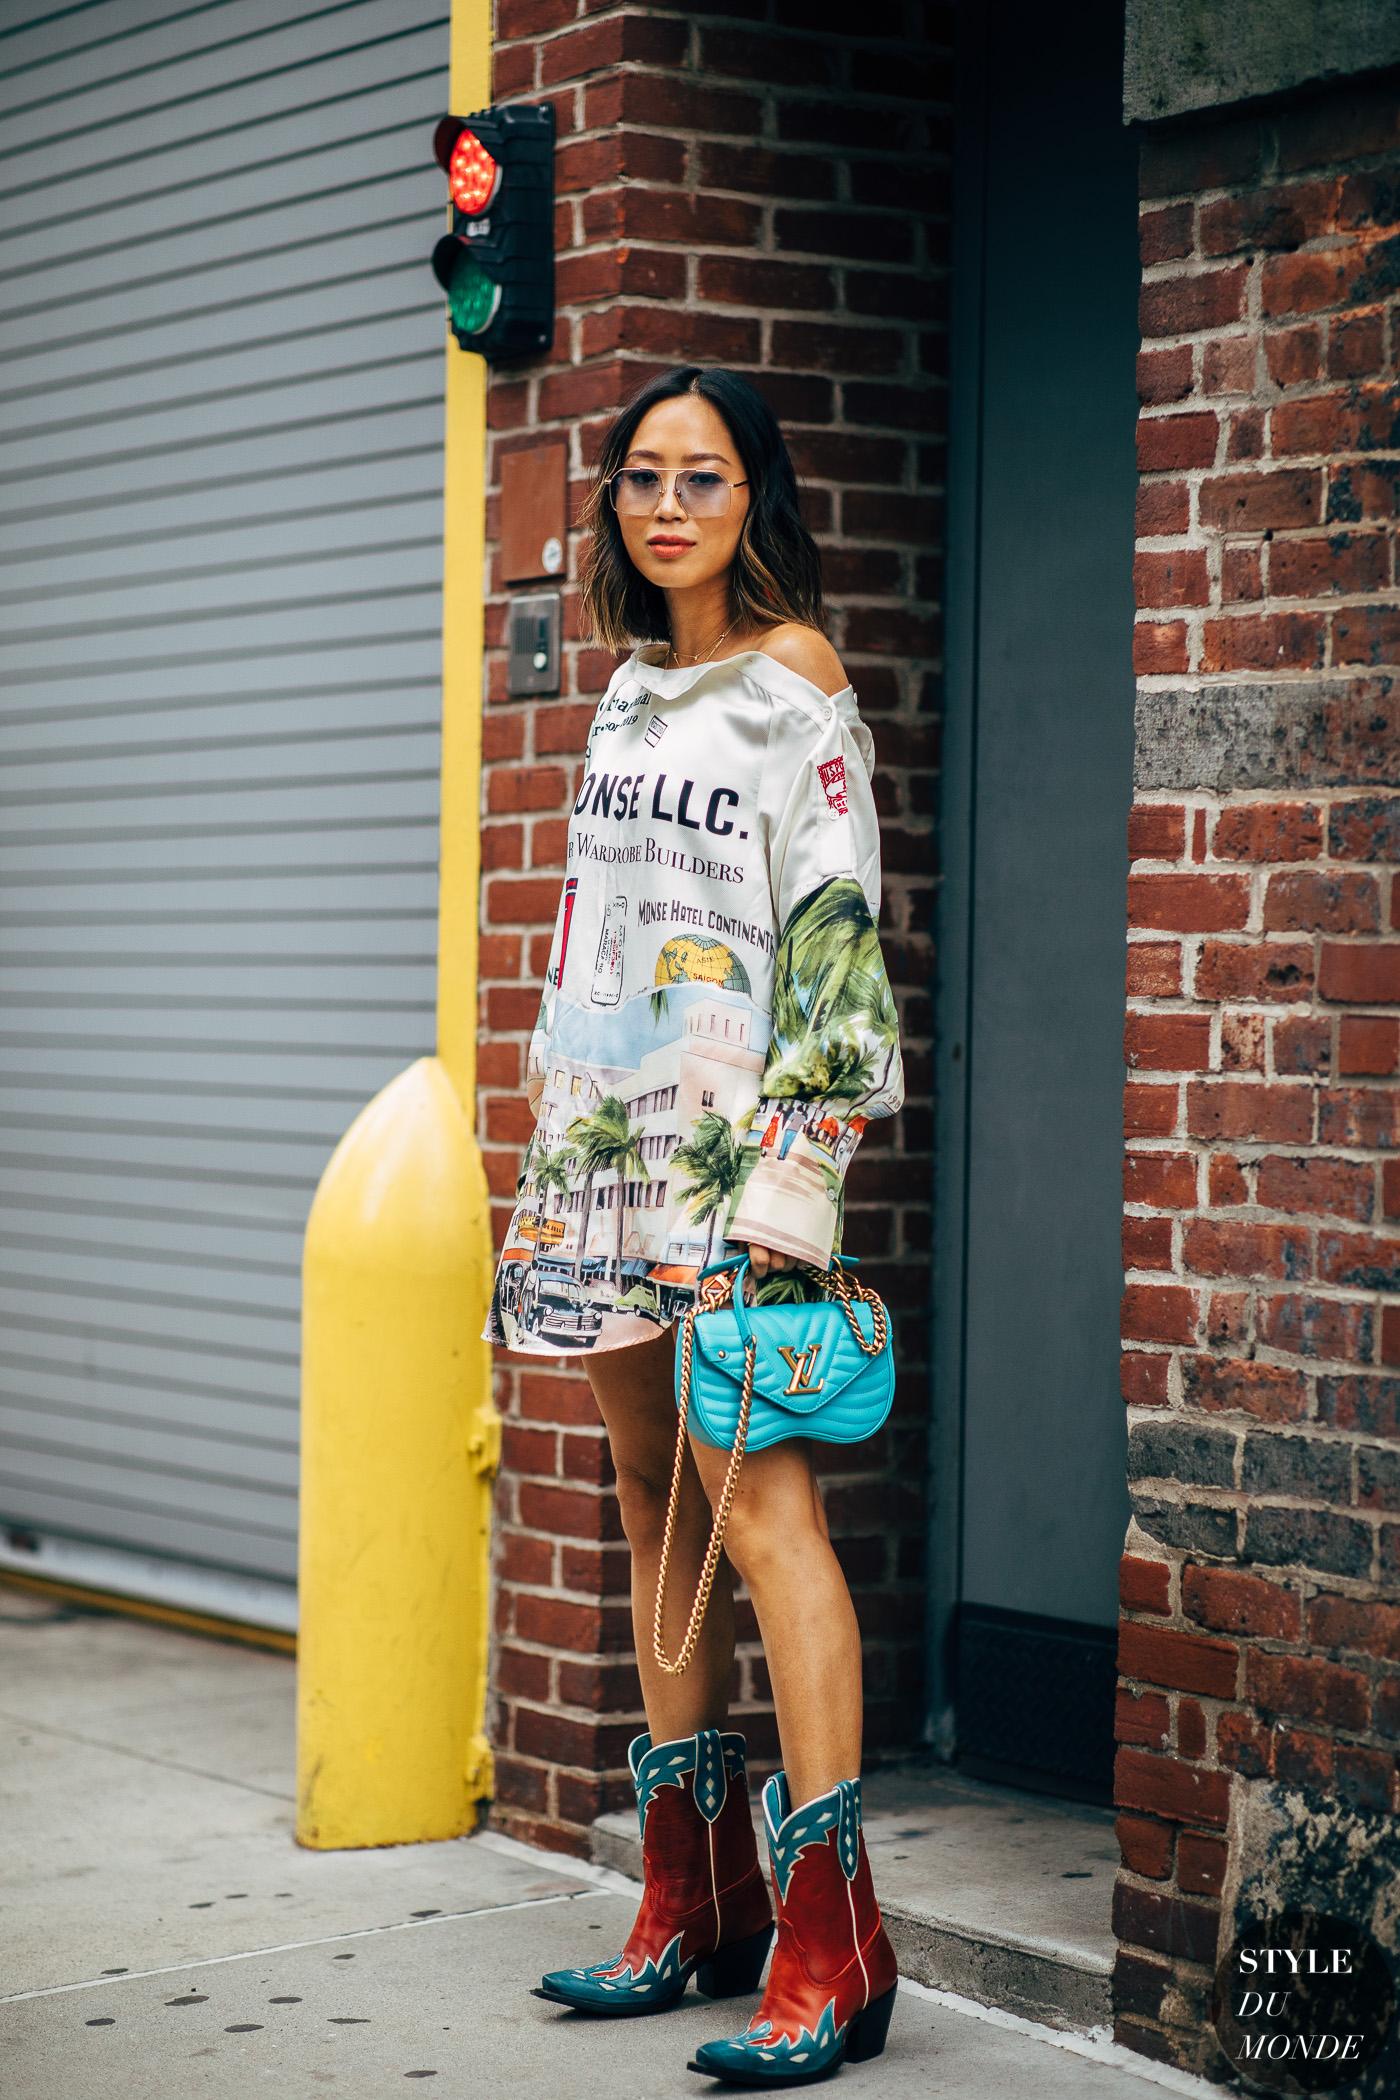 New York SS 2019 Street Style: Aimee Song - STYLE DU MONDE